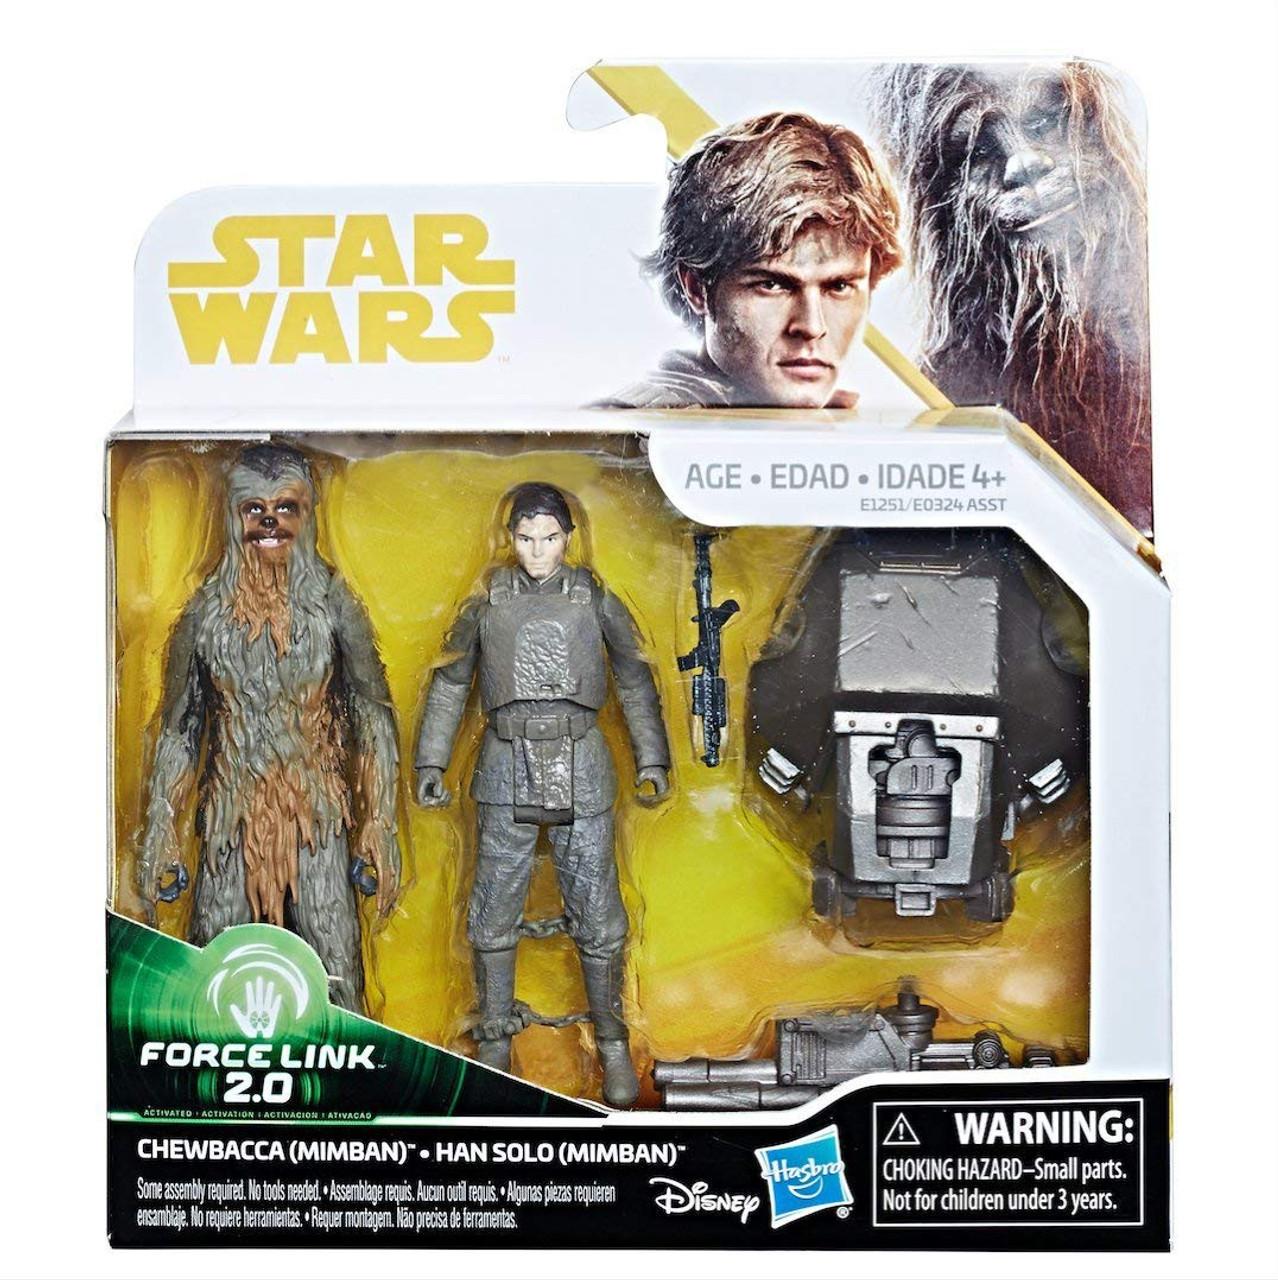 Hasbro Star Wars Force Link 2.0 Han Solo/'s Landspeeder Hasbro figure